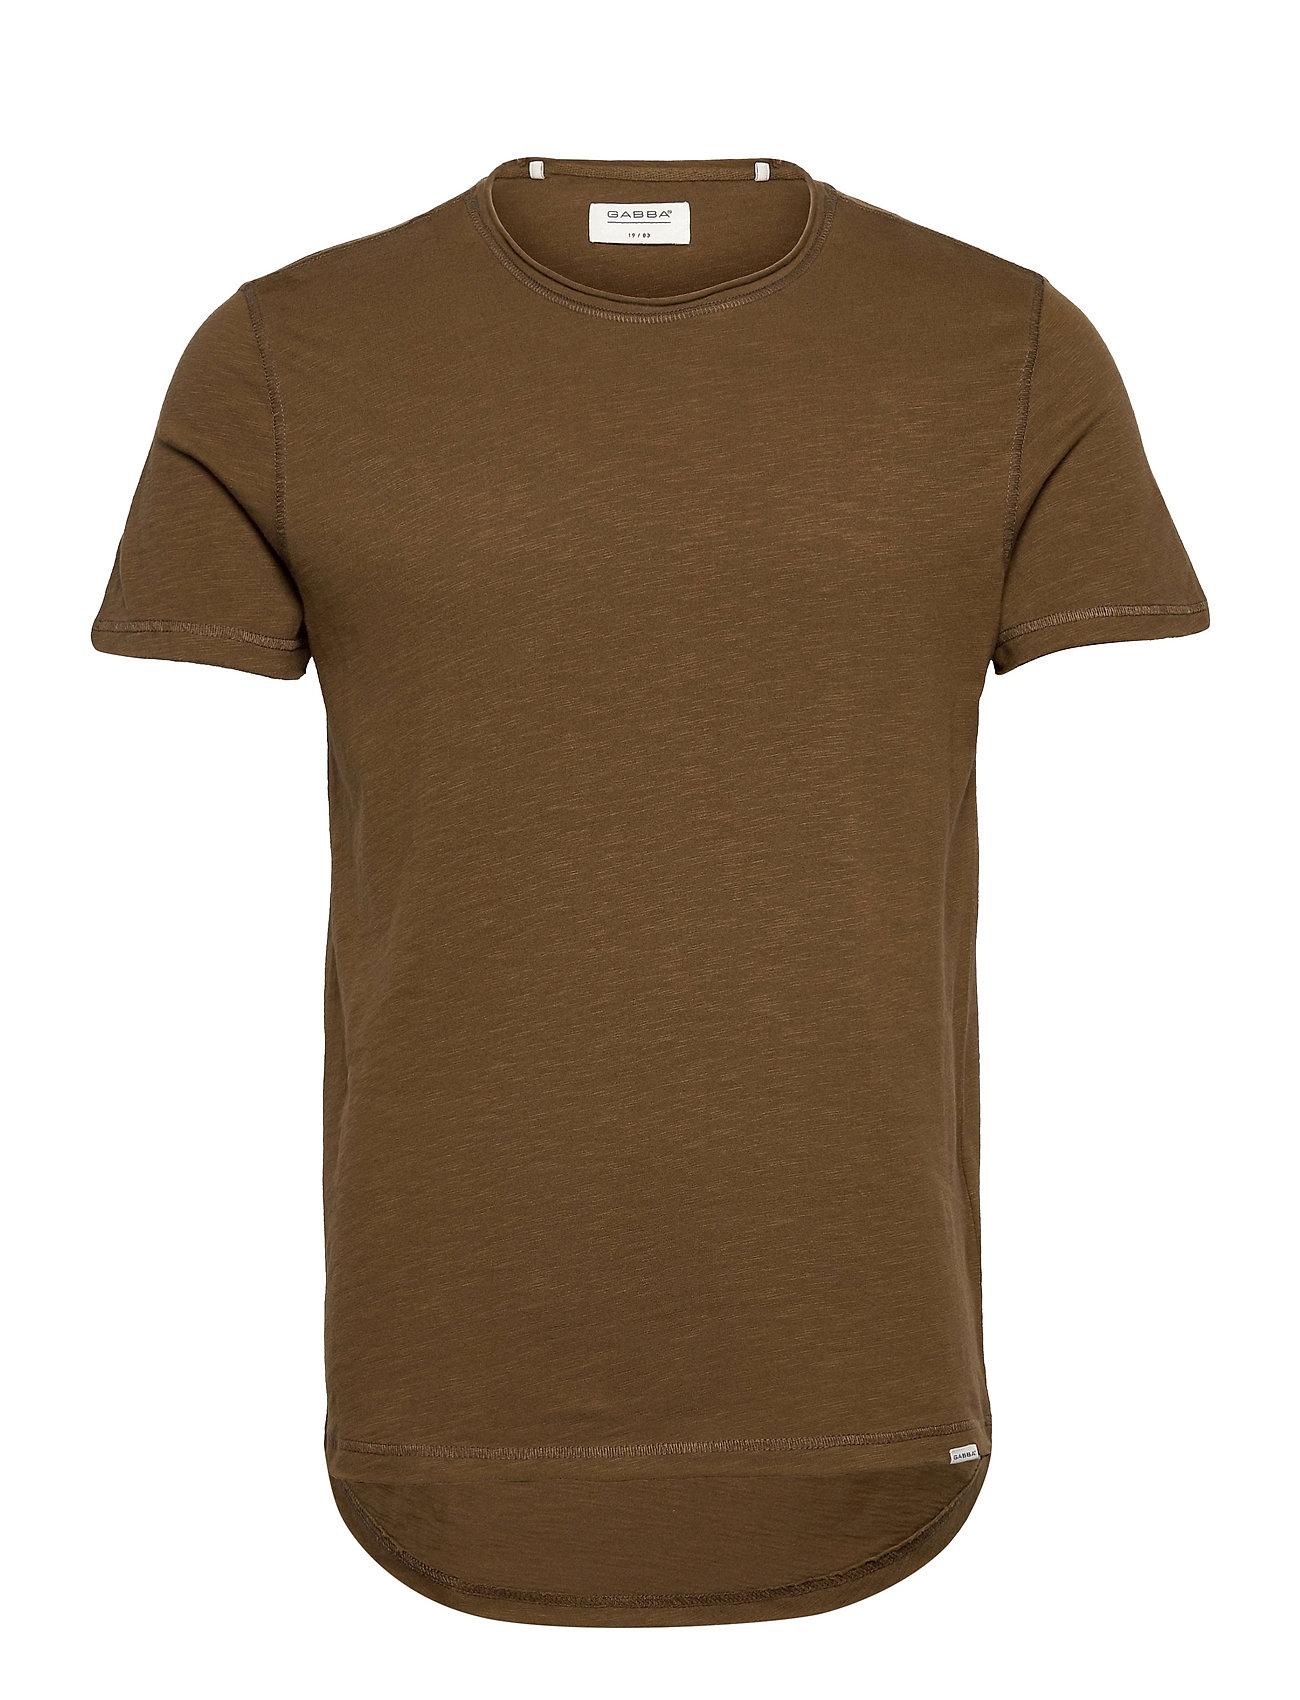 Image of Konrad Slub S/S Tee T-shirt Brun Gabba (3550634151)